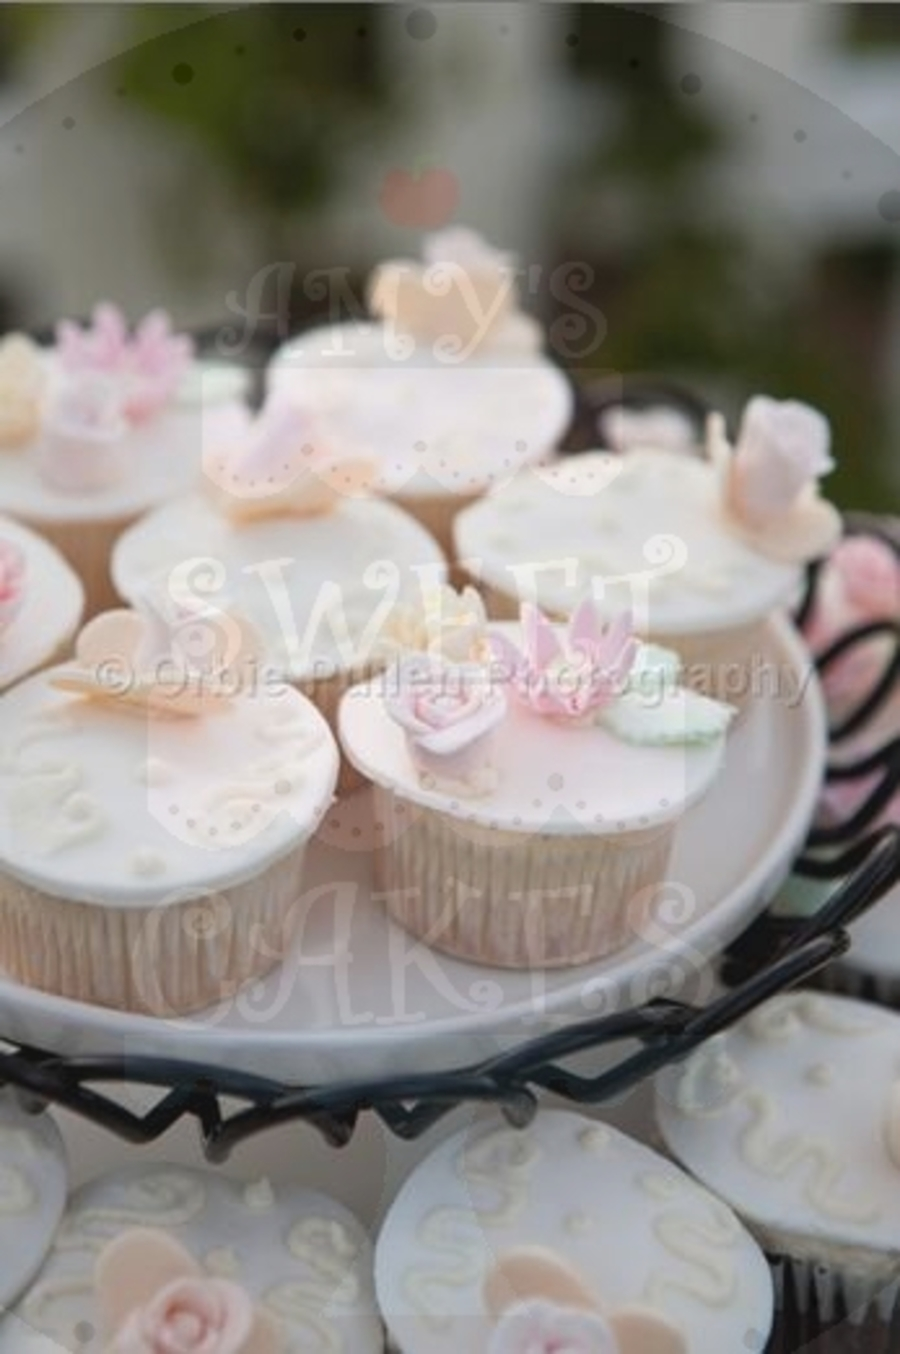 Wedding Cupcakes For A Summer Wedding - CakeCentral.com